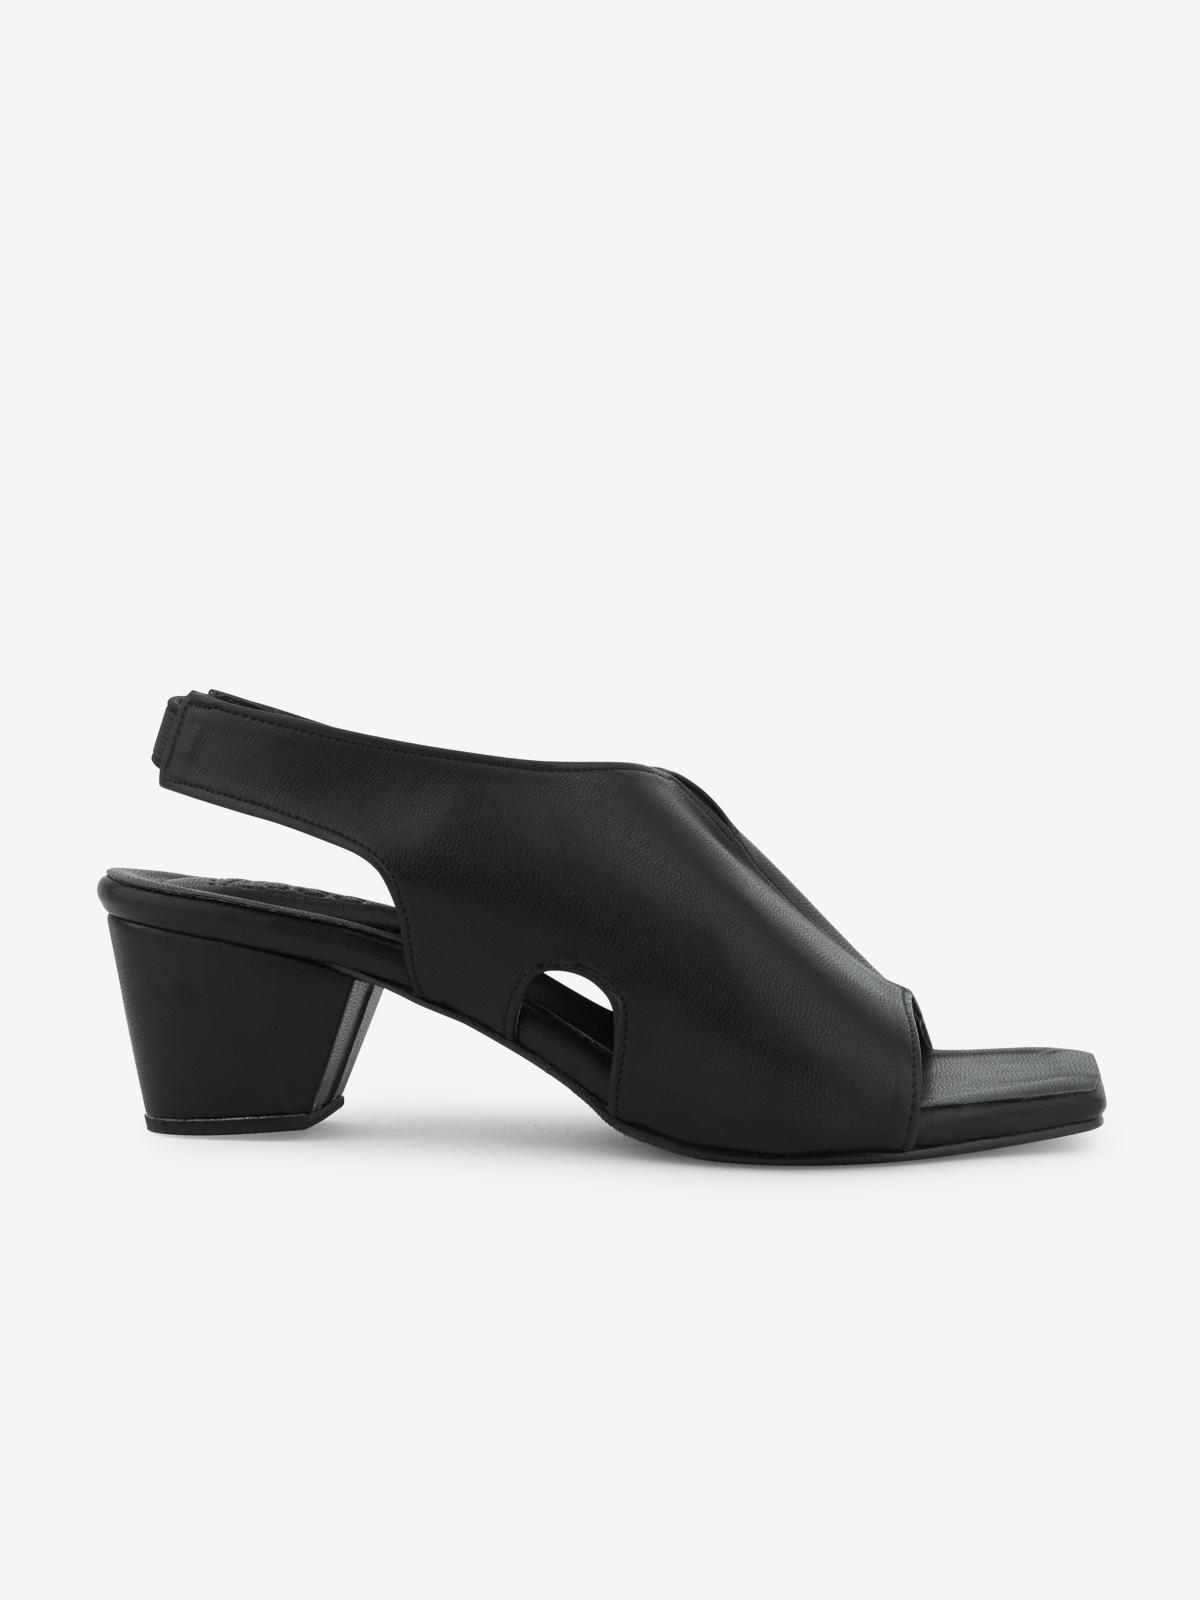 Mosstories Decon Square Toe Heels Black